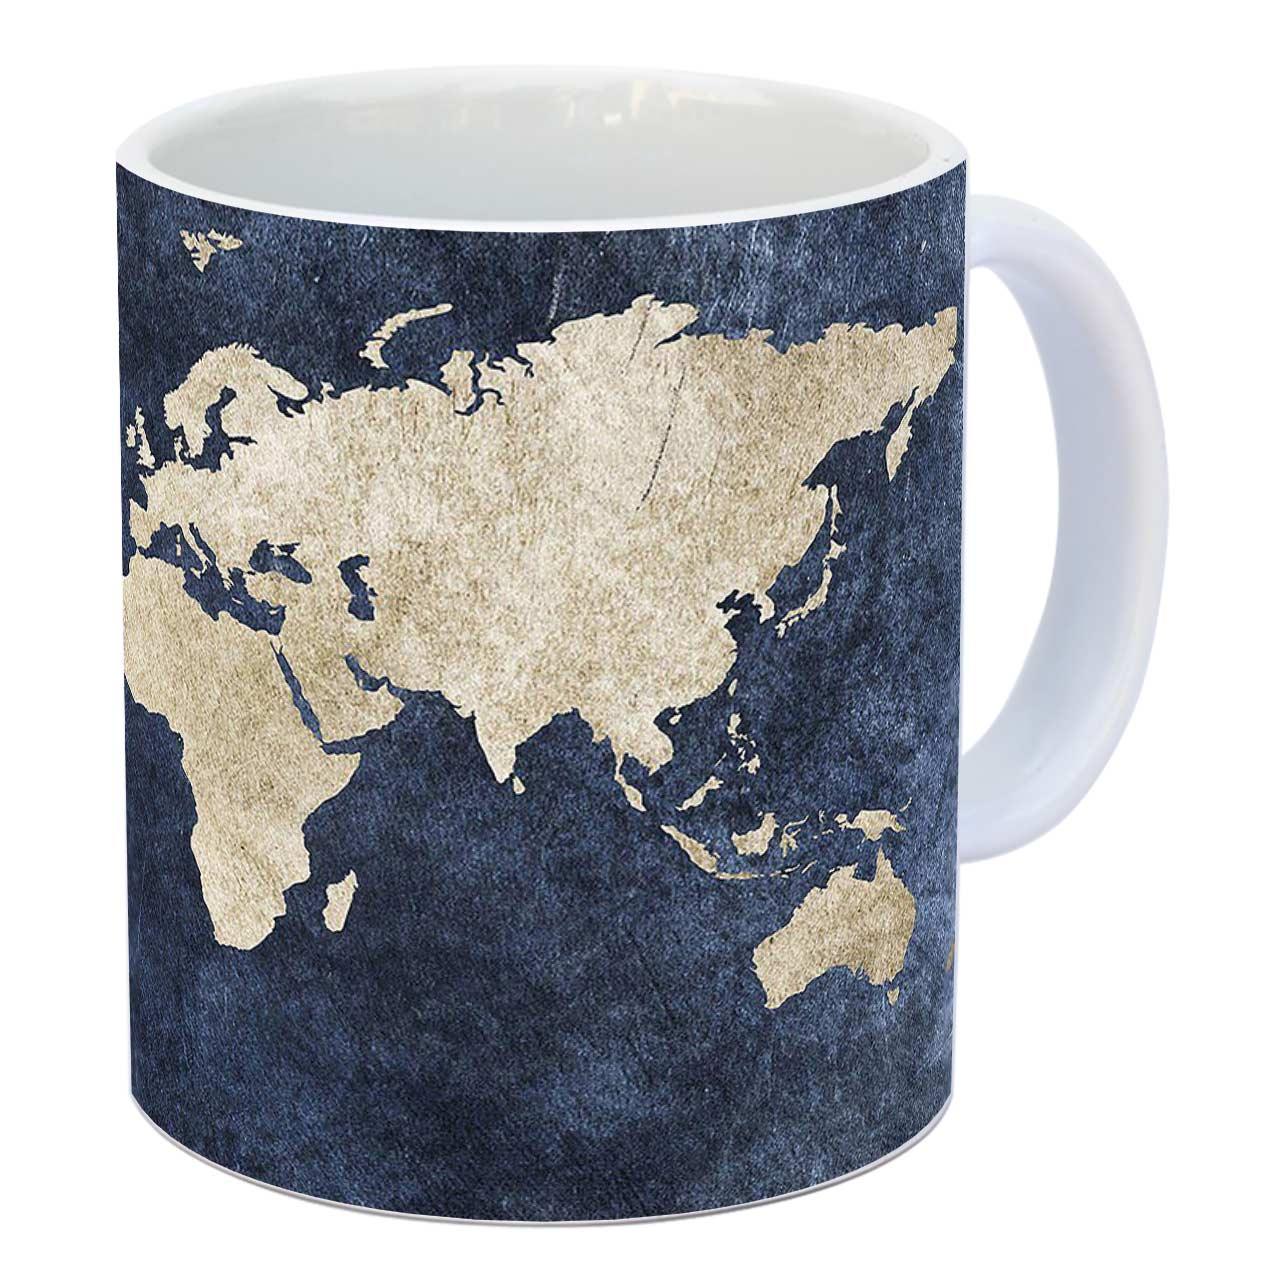 عکس ماگ زیزیپ طرح کره زمین کد 1418